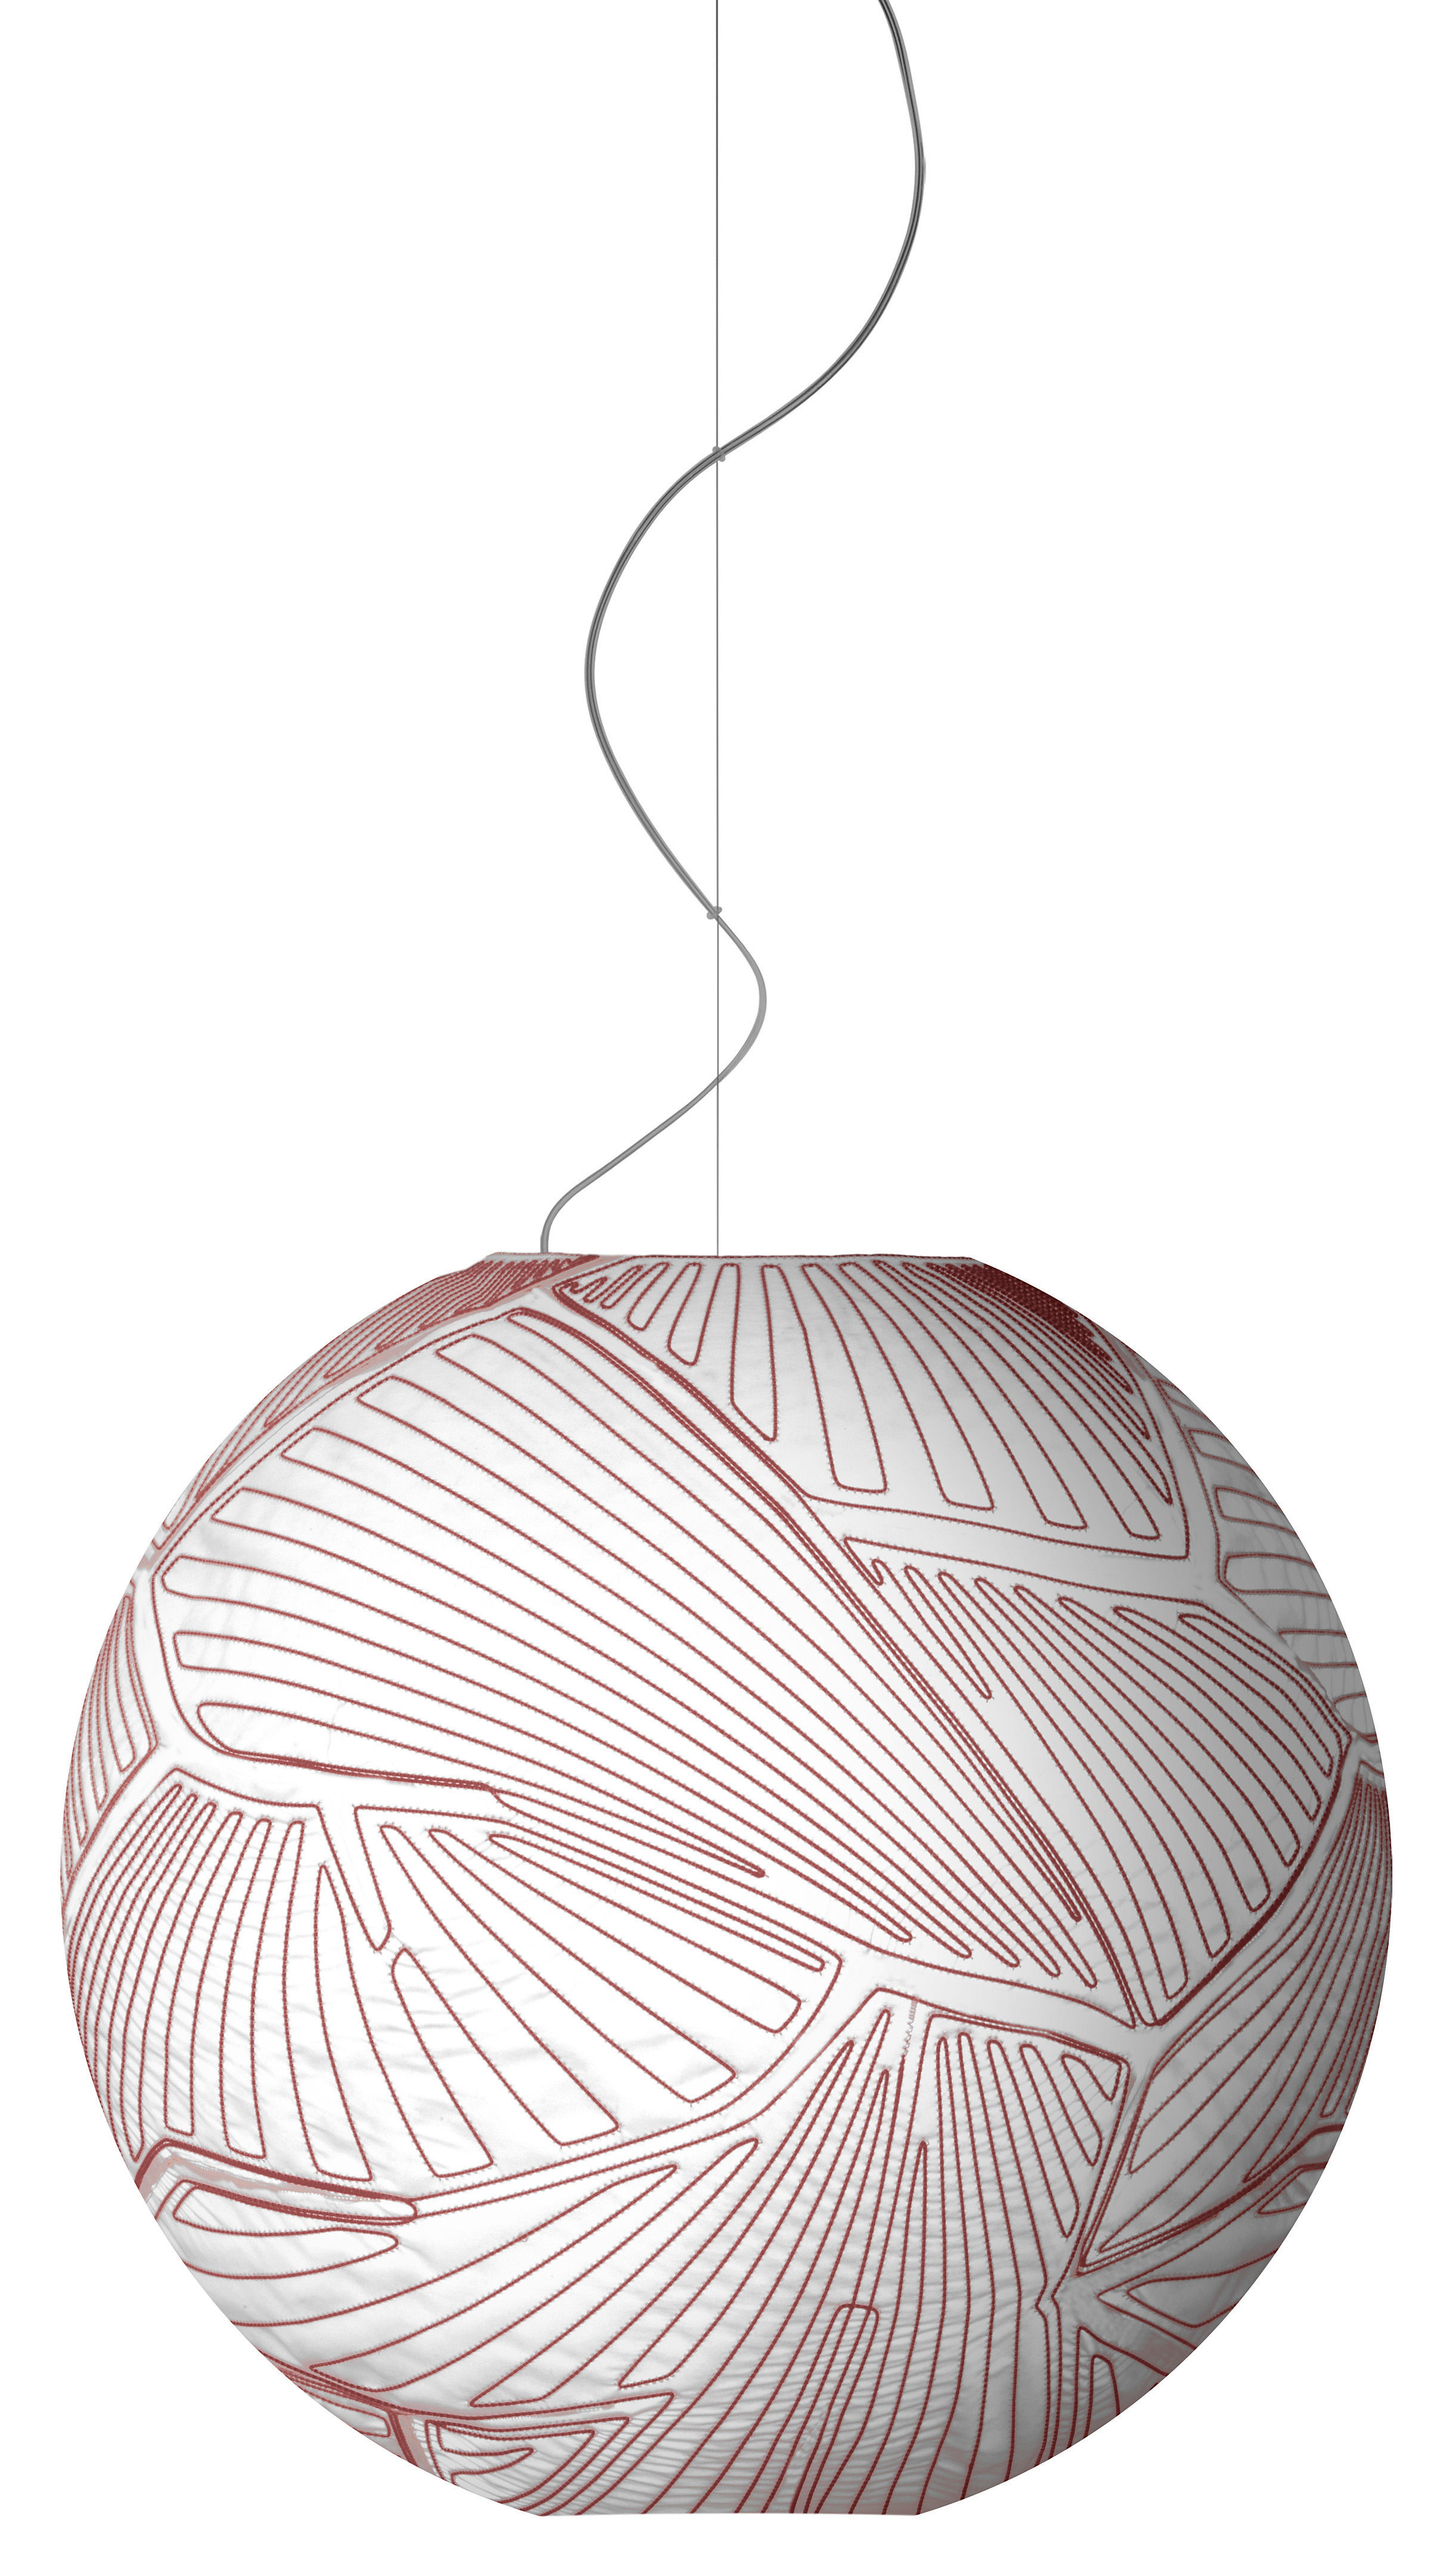 Illuminazione - Lampadari - Sospensione Planet Large - Grande Ø 80 cm - Fonte alogena di Foscarini - versione alogena - Bianco/ Cuciture Rosse - Tessuto